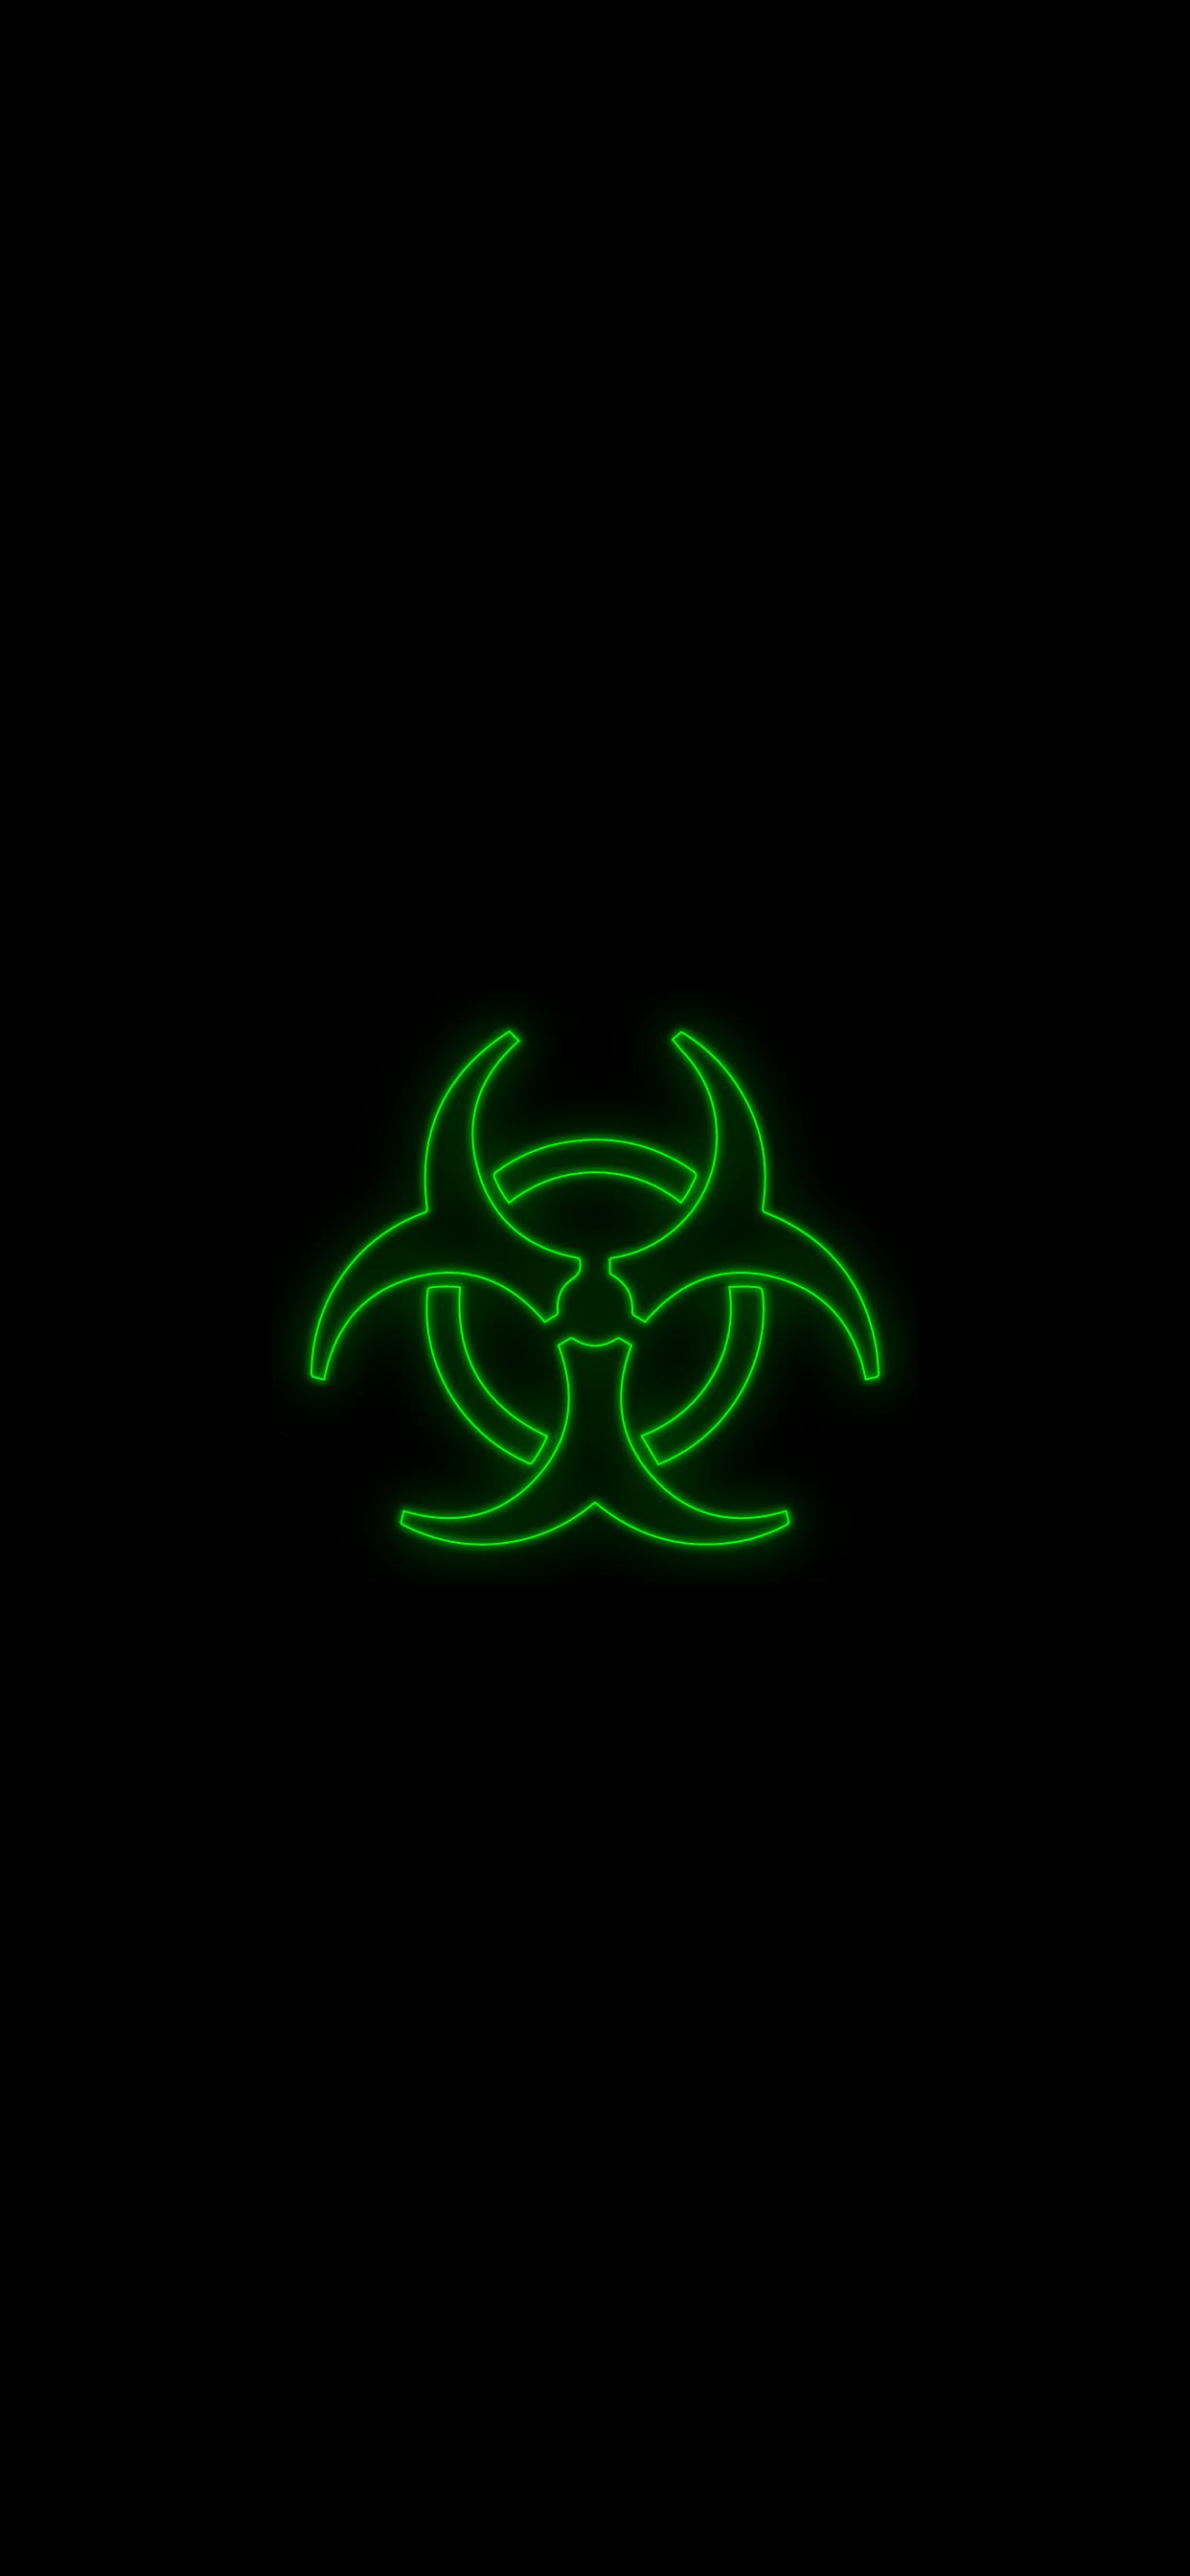 neon biohazard symbol green